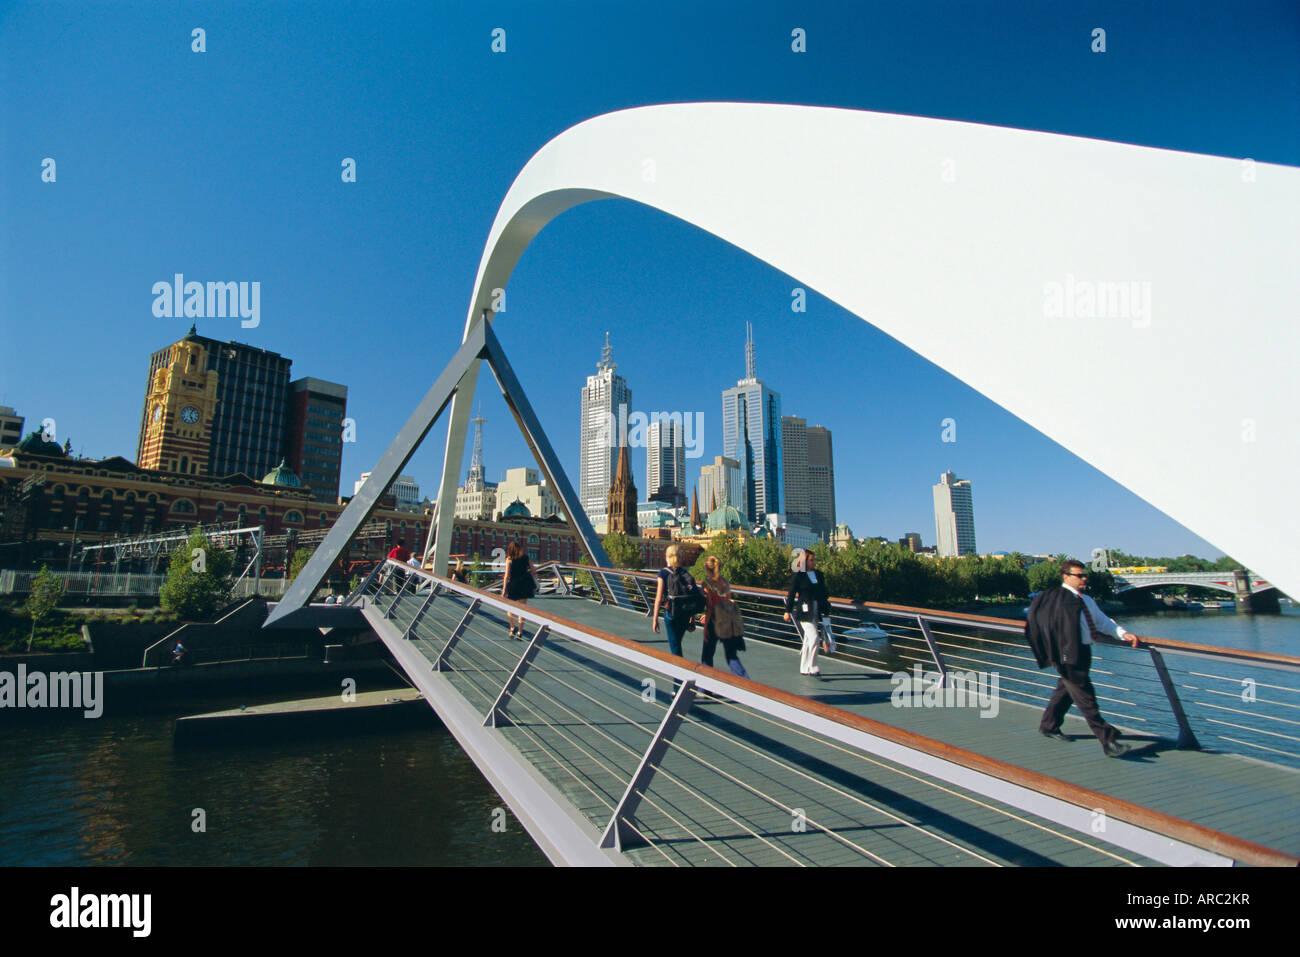 City skyline from Southgate, Melbourne, Victoria, Australia - Stock Image